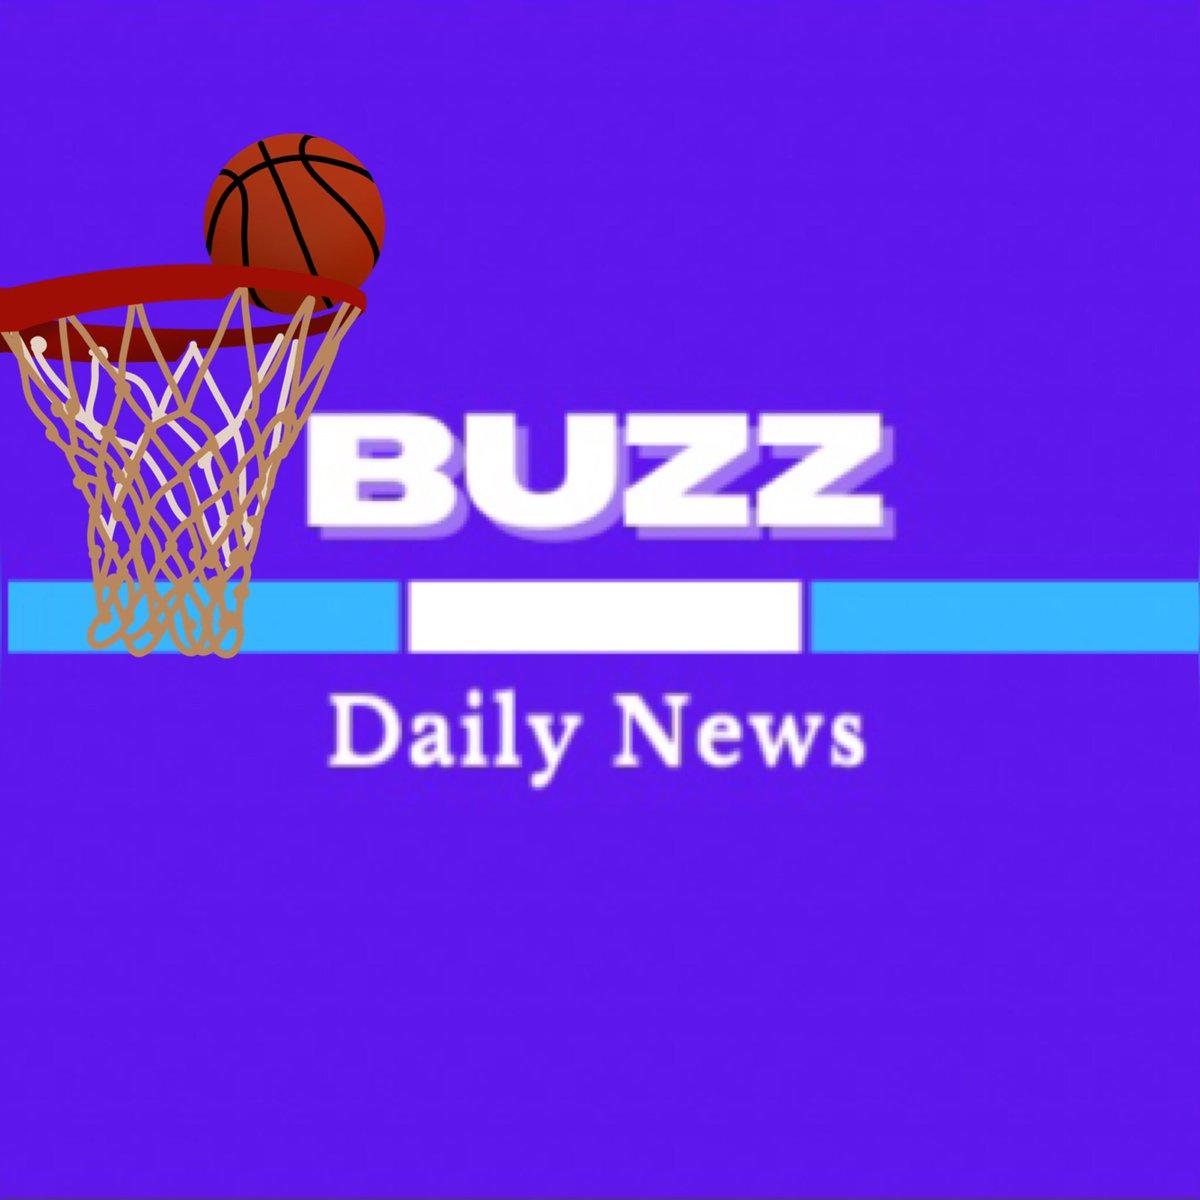 Who's excited for a new season of Charlotte Hornets Basketball??? #charlottehornets #nba #nbabasketball #nbanews https://t.co/SKf2RCXonn